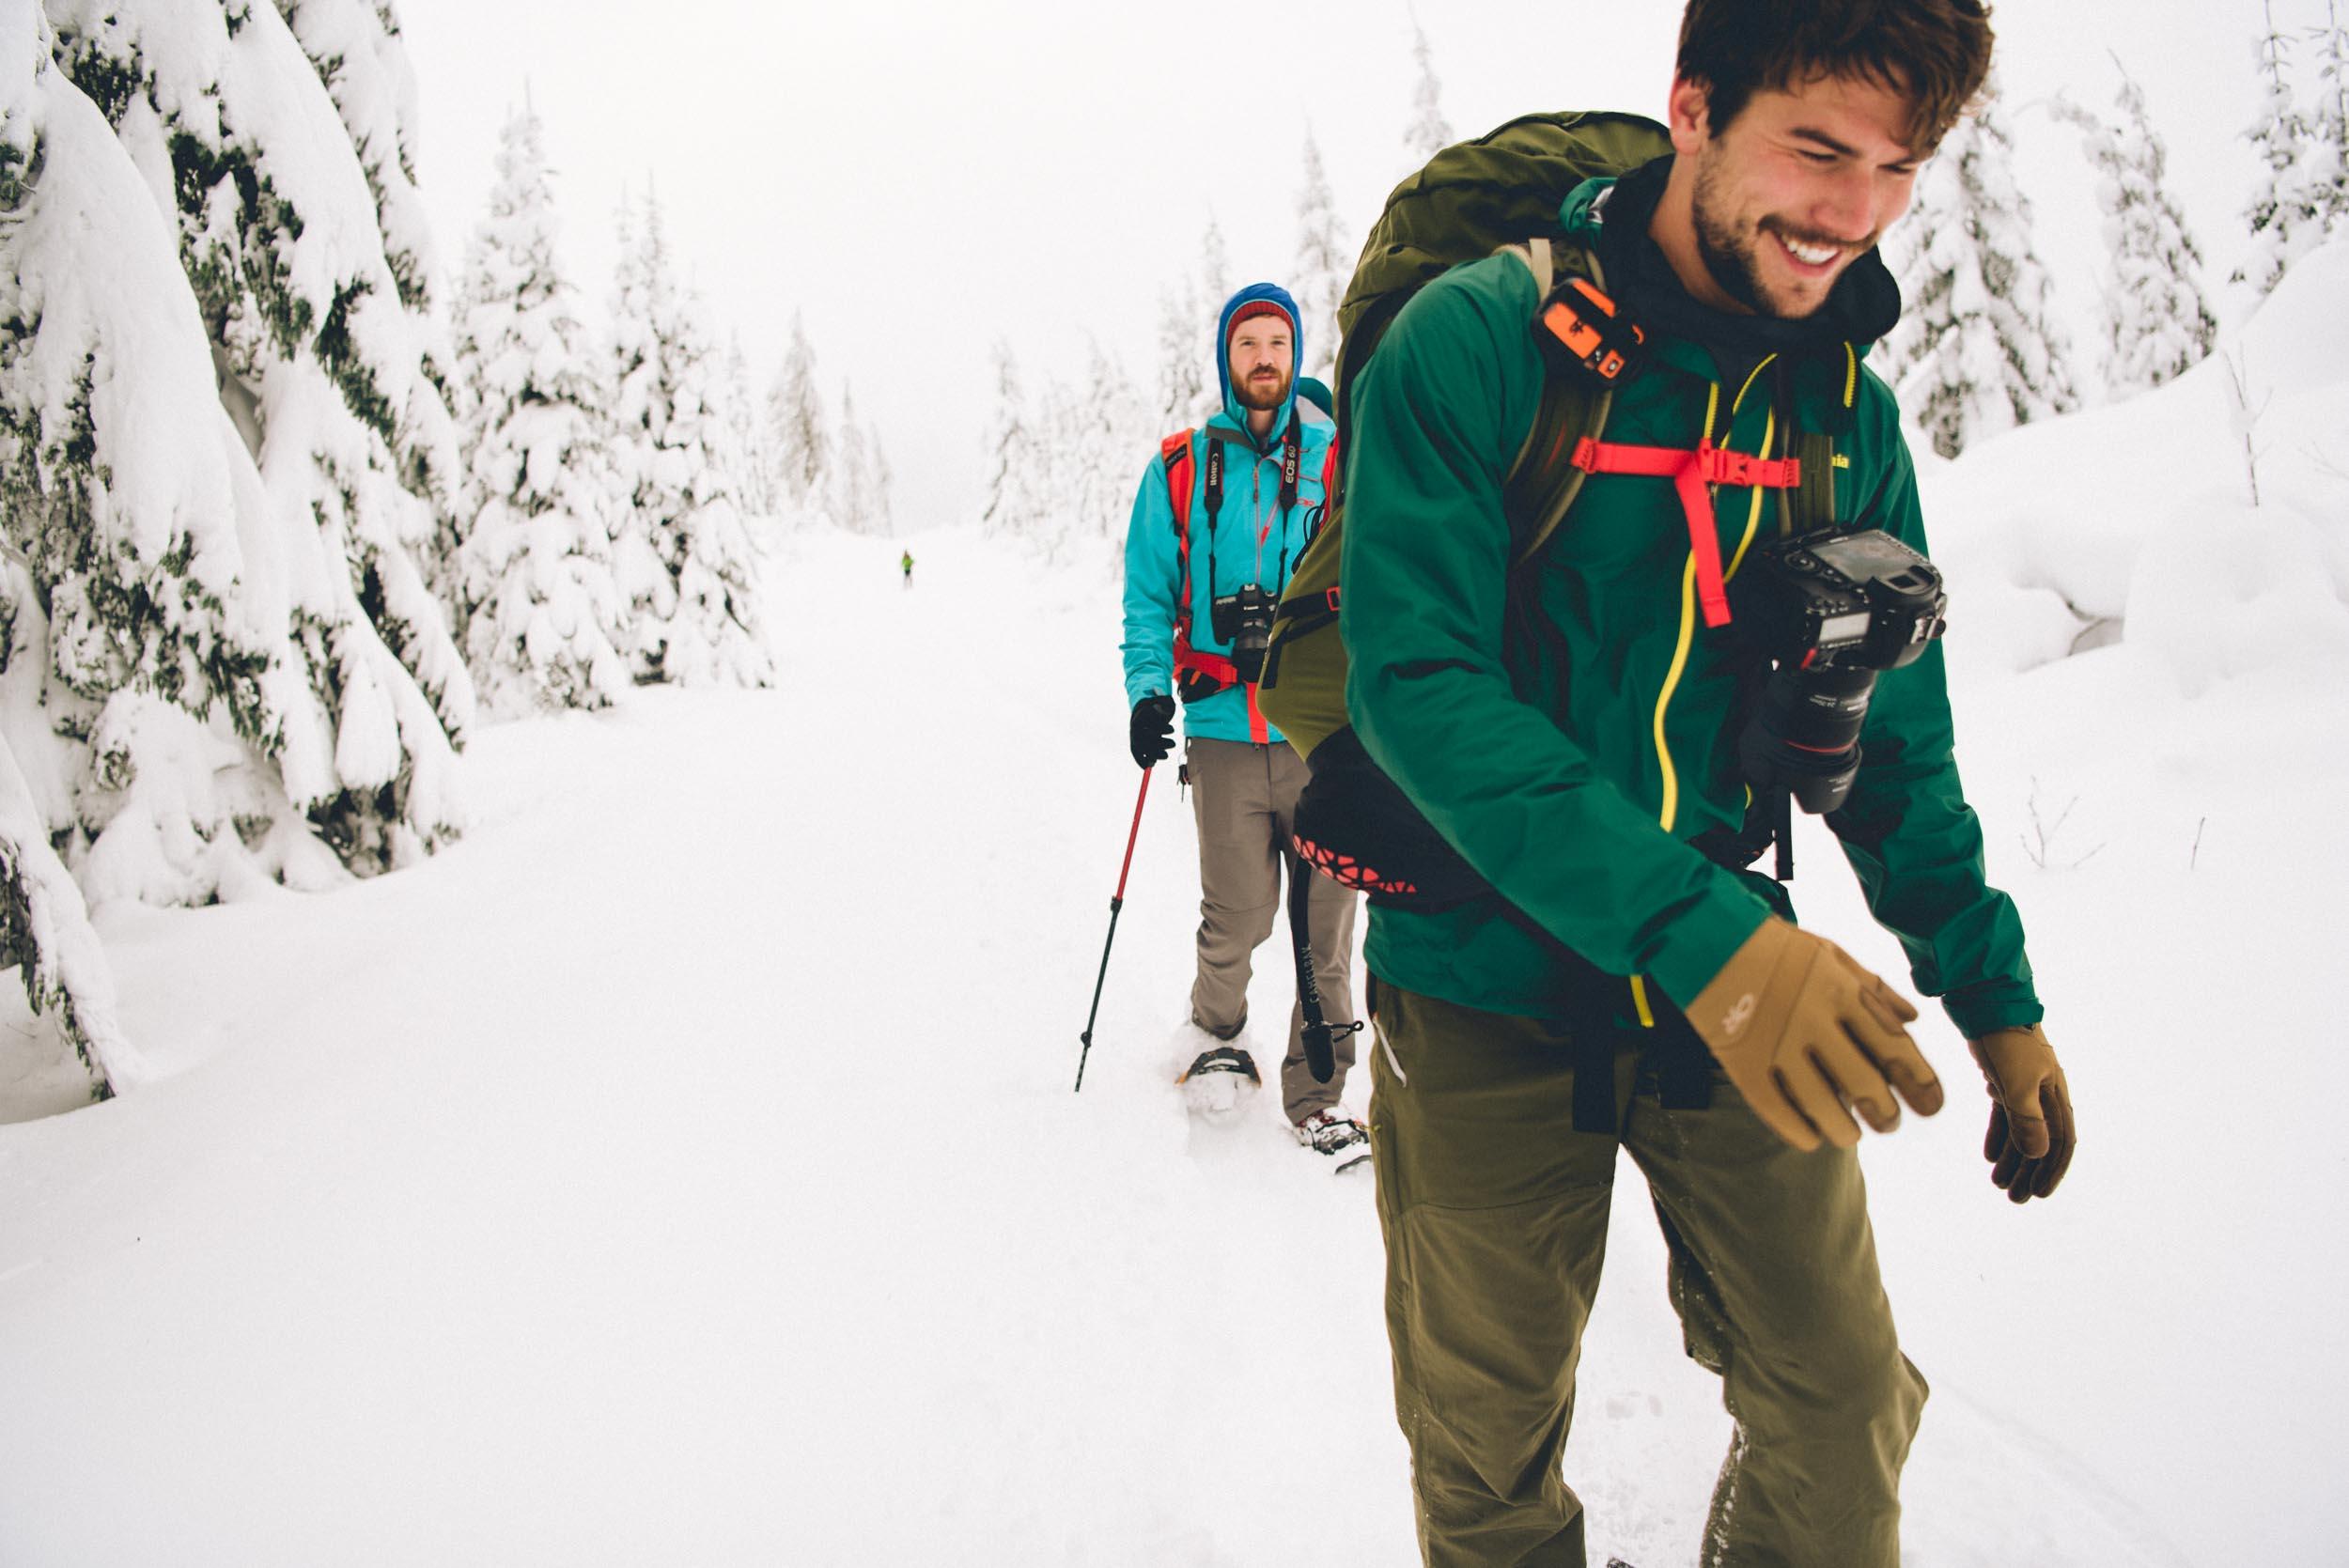 Miriam-Subbiah-Snow-Bowl-Hut-28.jpg